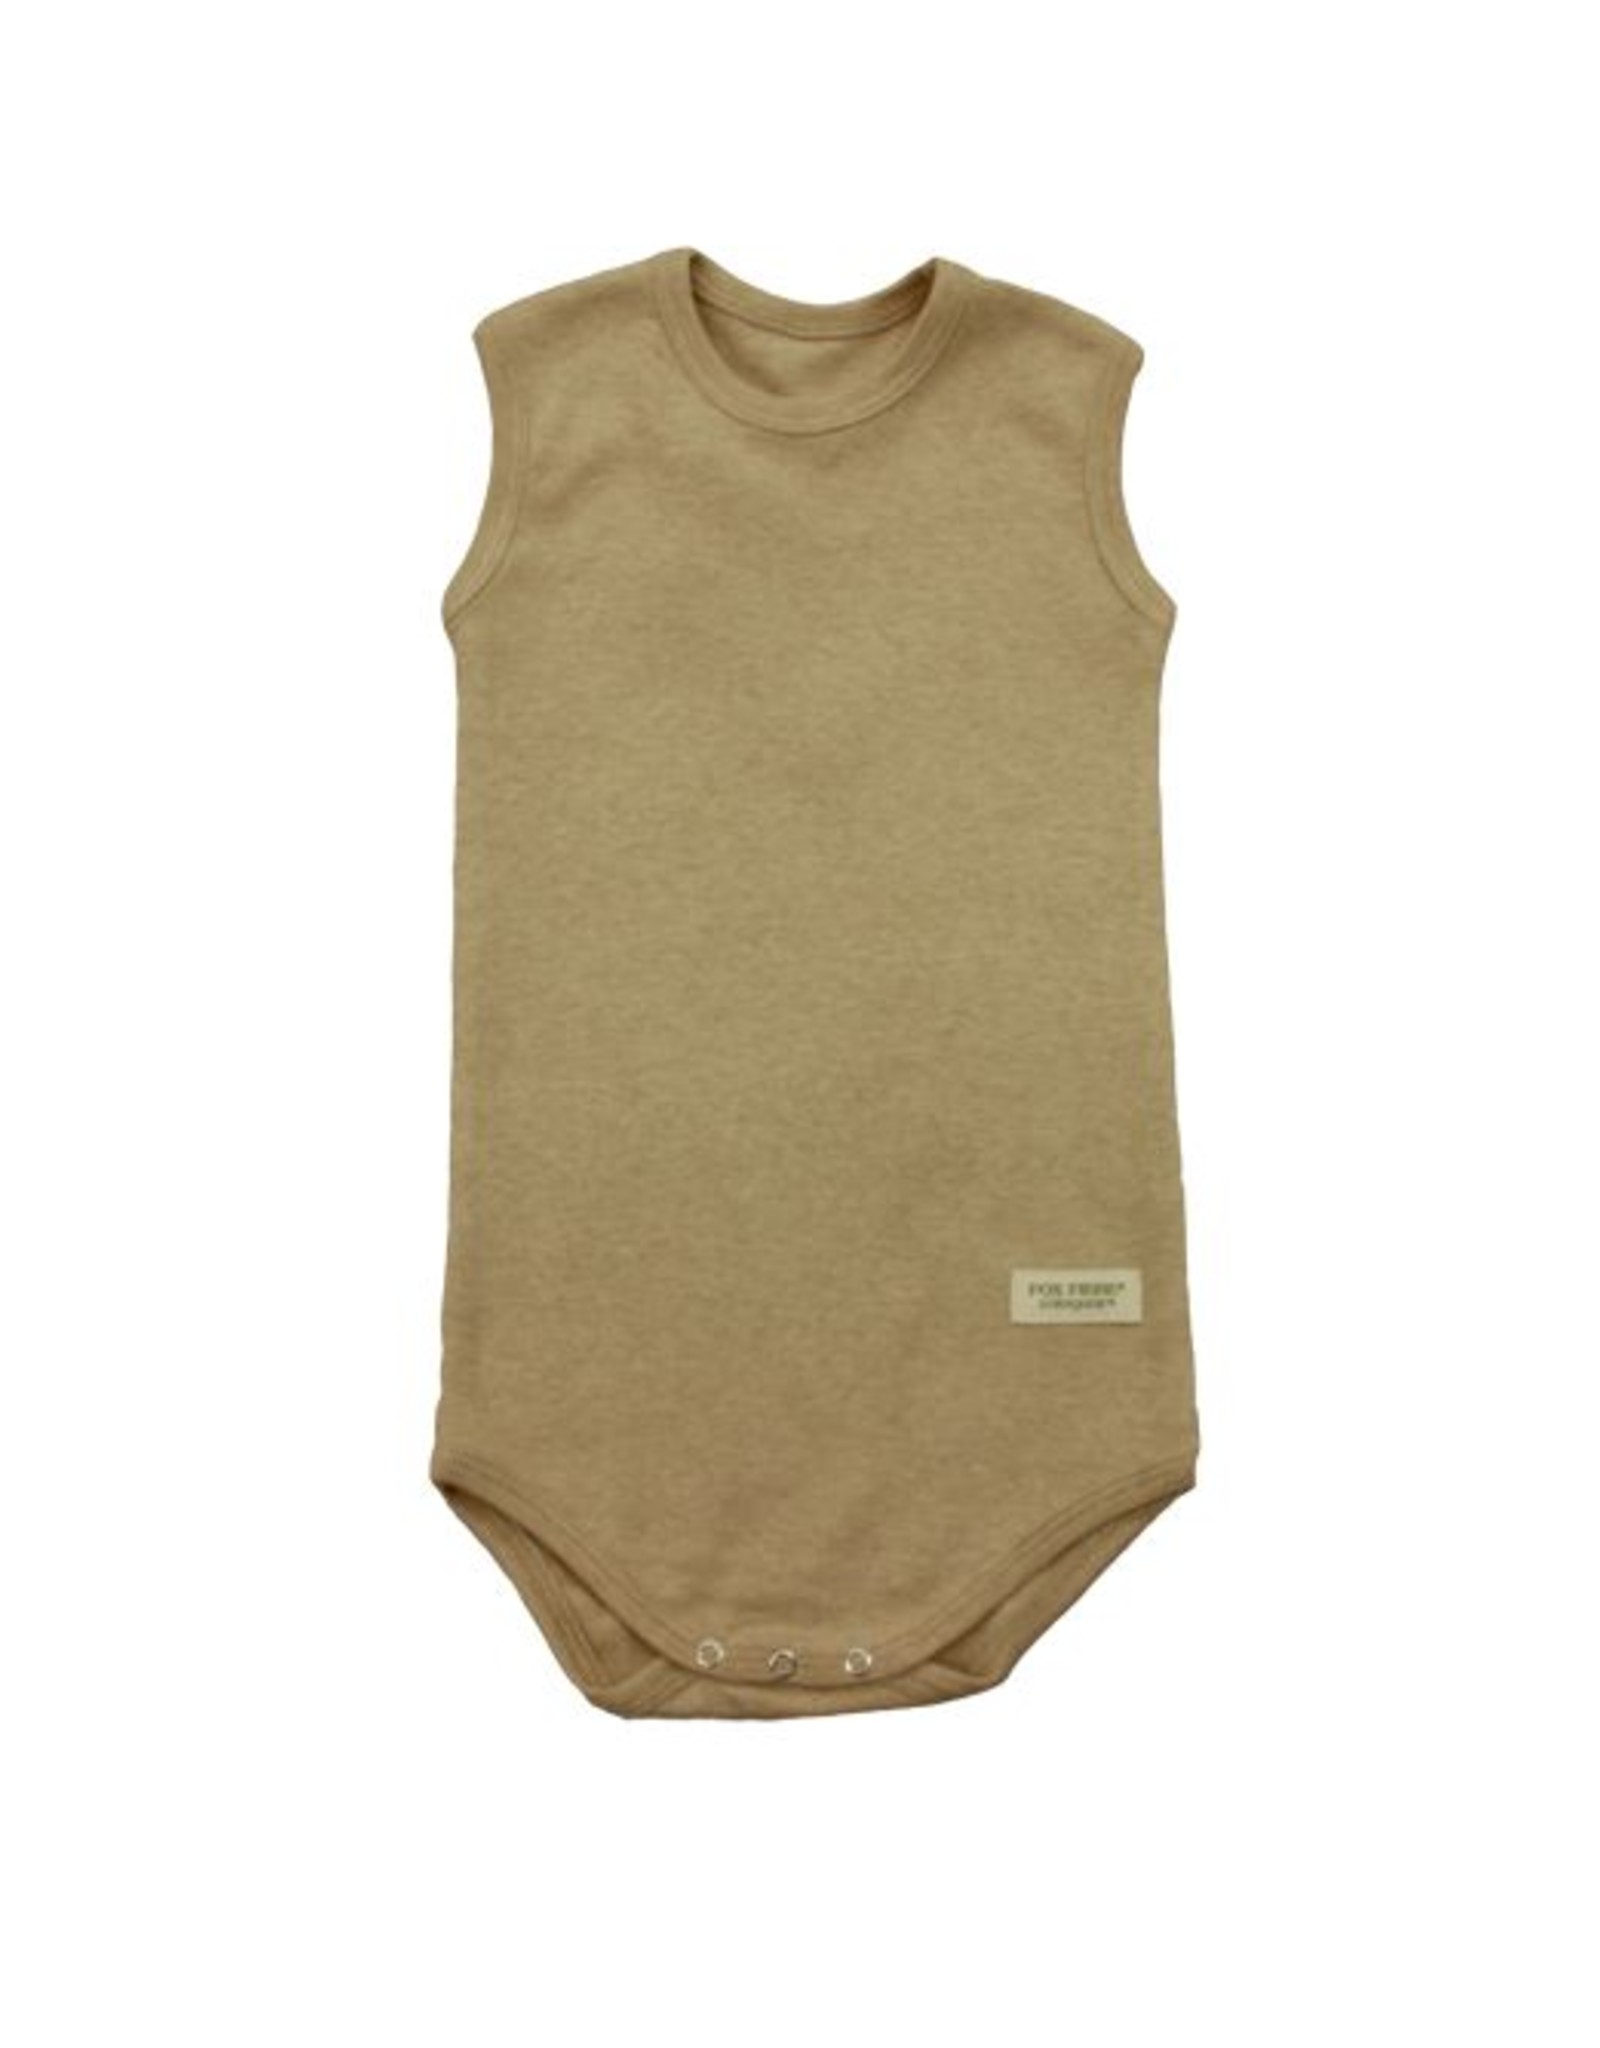 Body sleeveless baby. sizes 1, 3, 6 months.